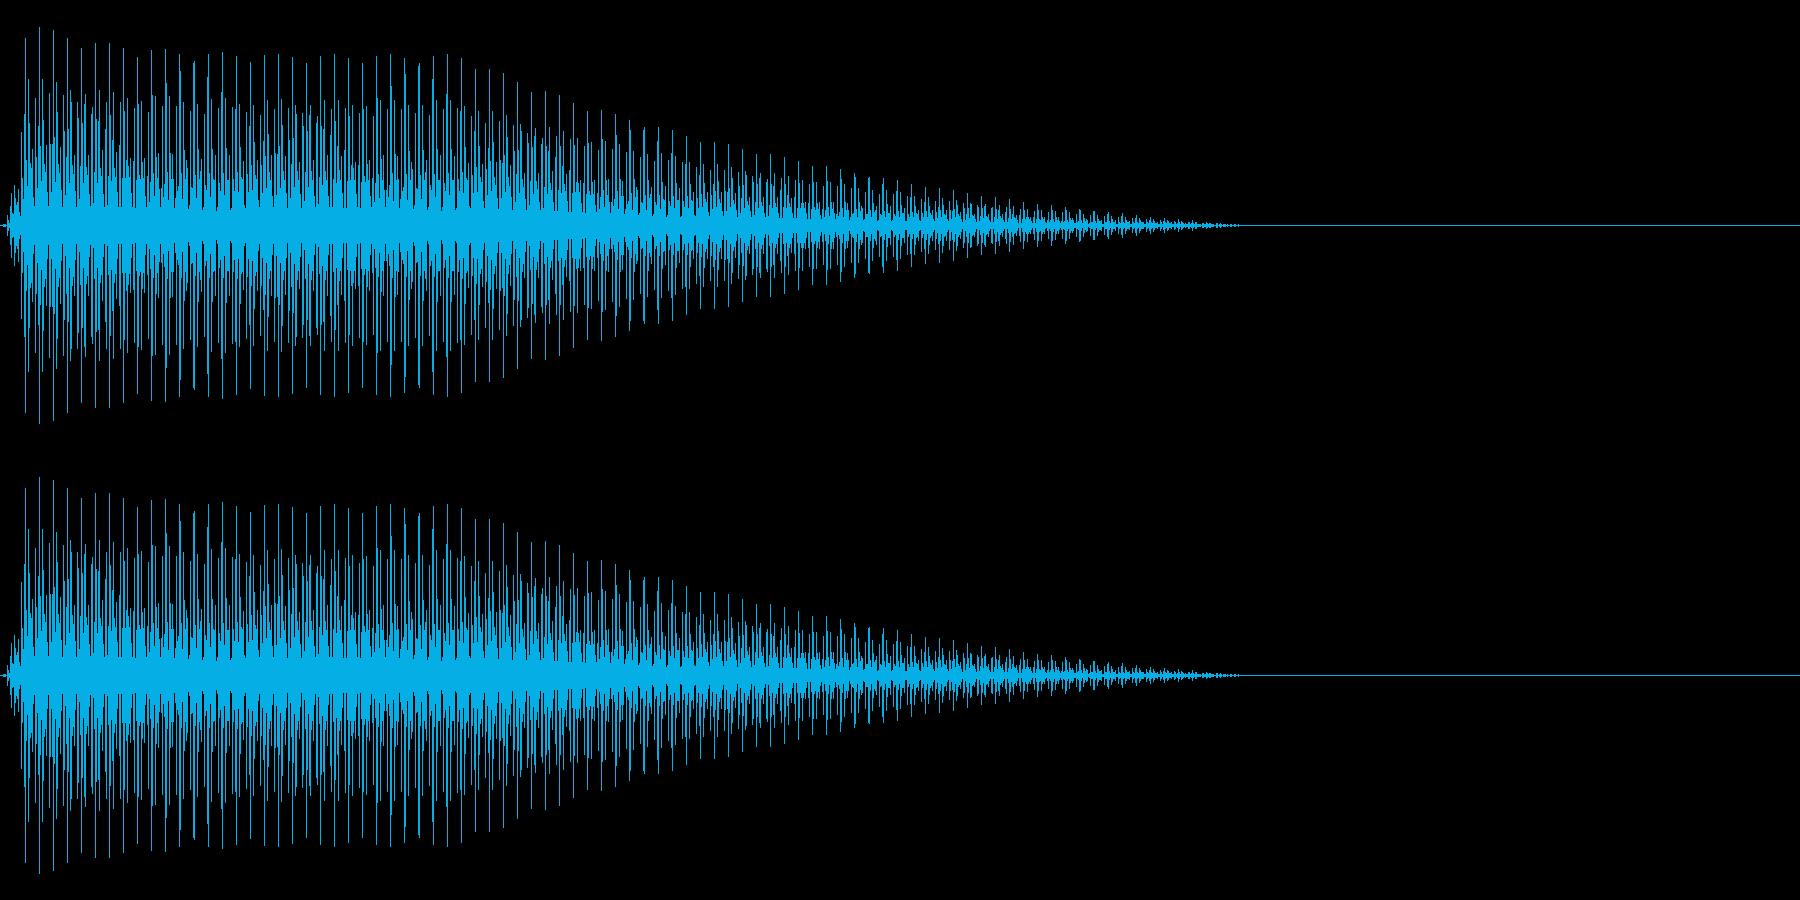 OctaveCom アプリ用タッチ音8の再生済みの波形